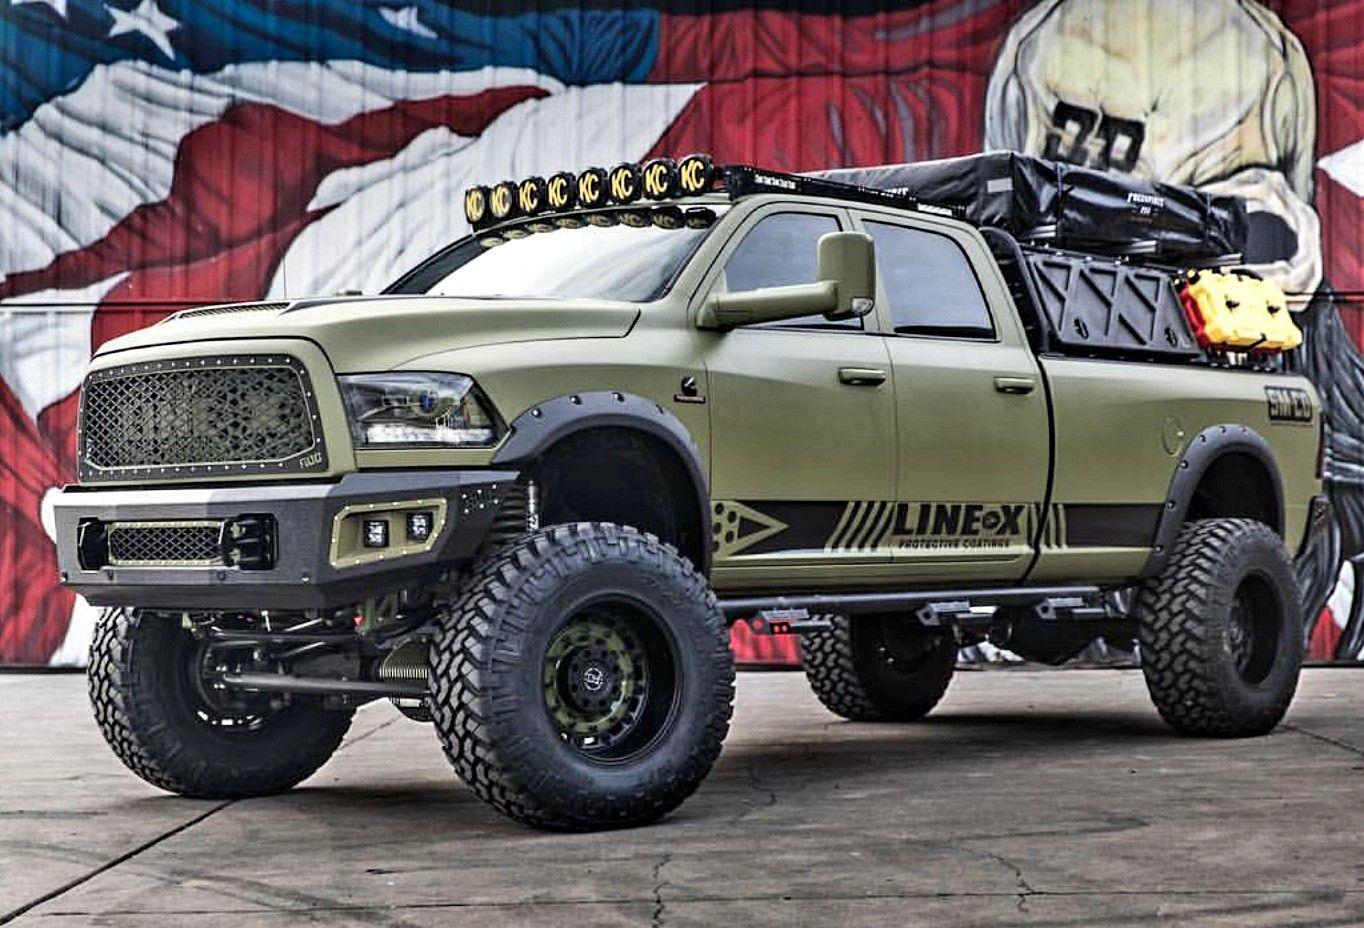 Pin By Sam Santana On Cars And Motorcycles In 2020 Dodge Ram Diesel Dodge Trucks Dodge Trucks Ram